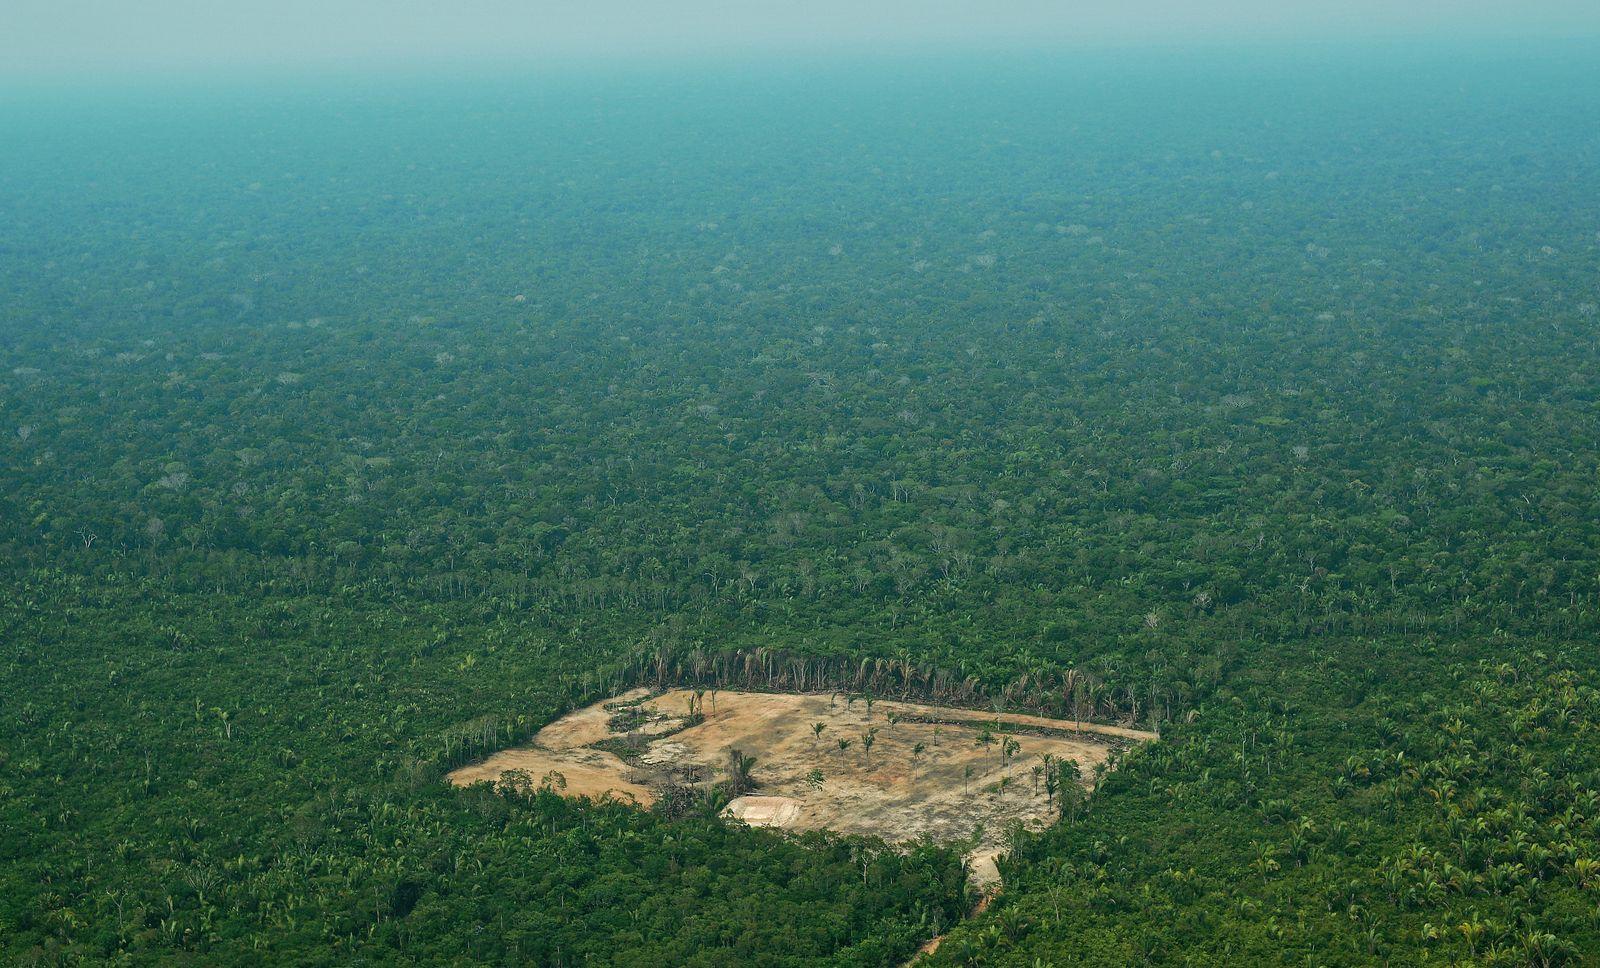 DOUNIAMAG-FILES-BRAZIL-ENVIRONMENT-ENERGY-CLIMATE-CONSUMERS-POLL